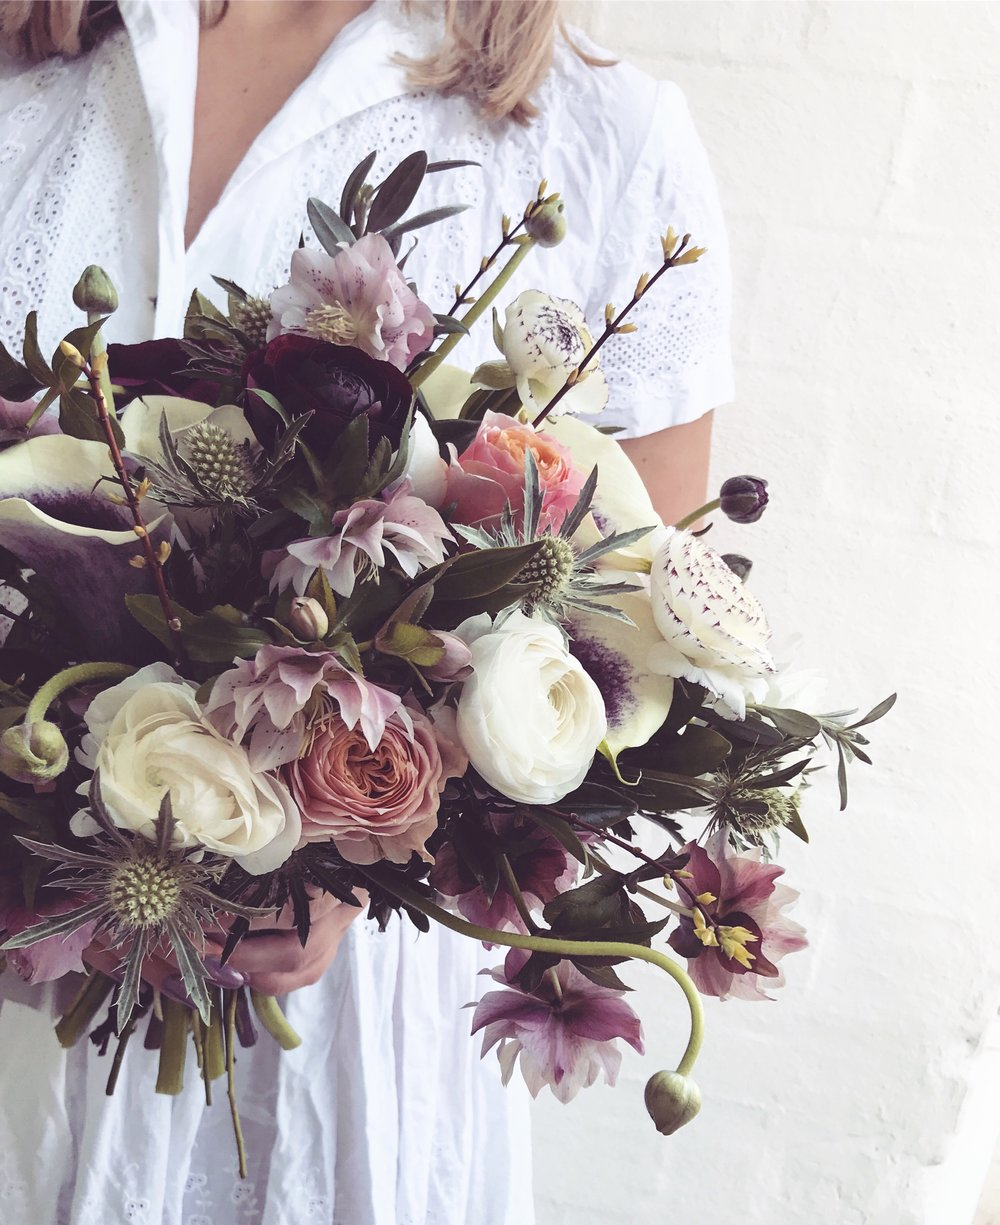 Bridal-Bouquet-Flowers-Webb-and-Farrer-Brighton-Sussex-Wedding-Florist (1).jpg